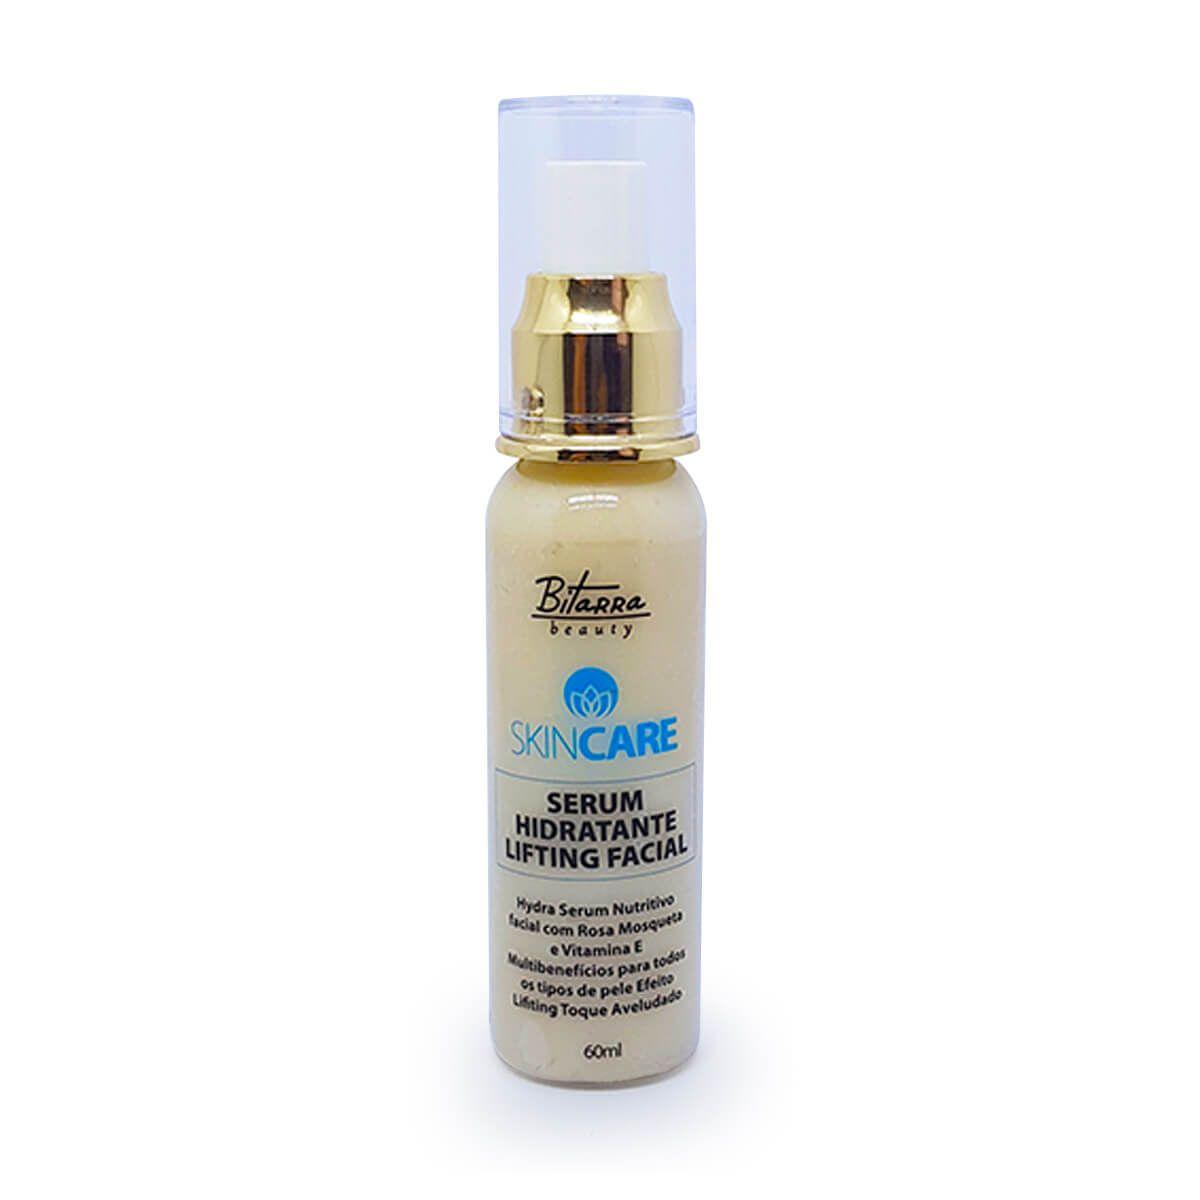 Serum Hidratante Lifting Facial Bitarra